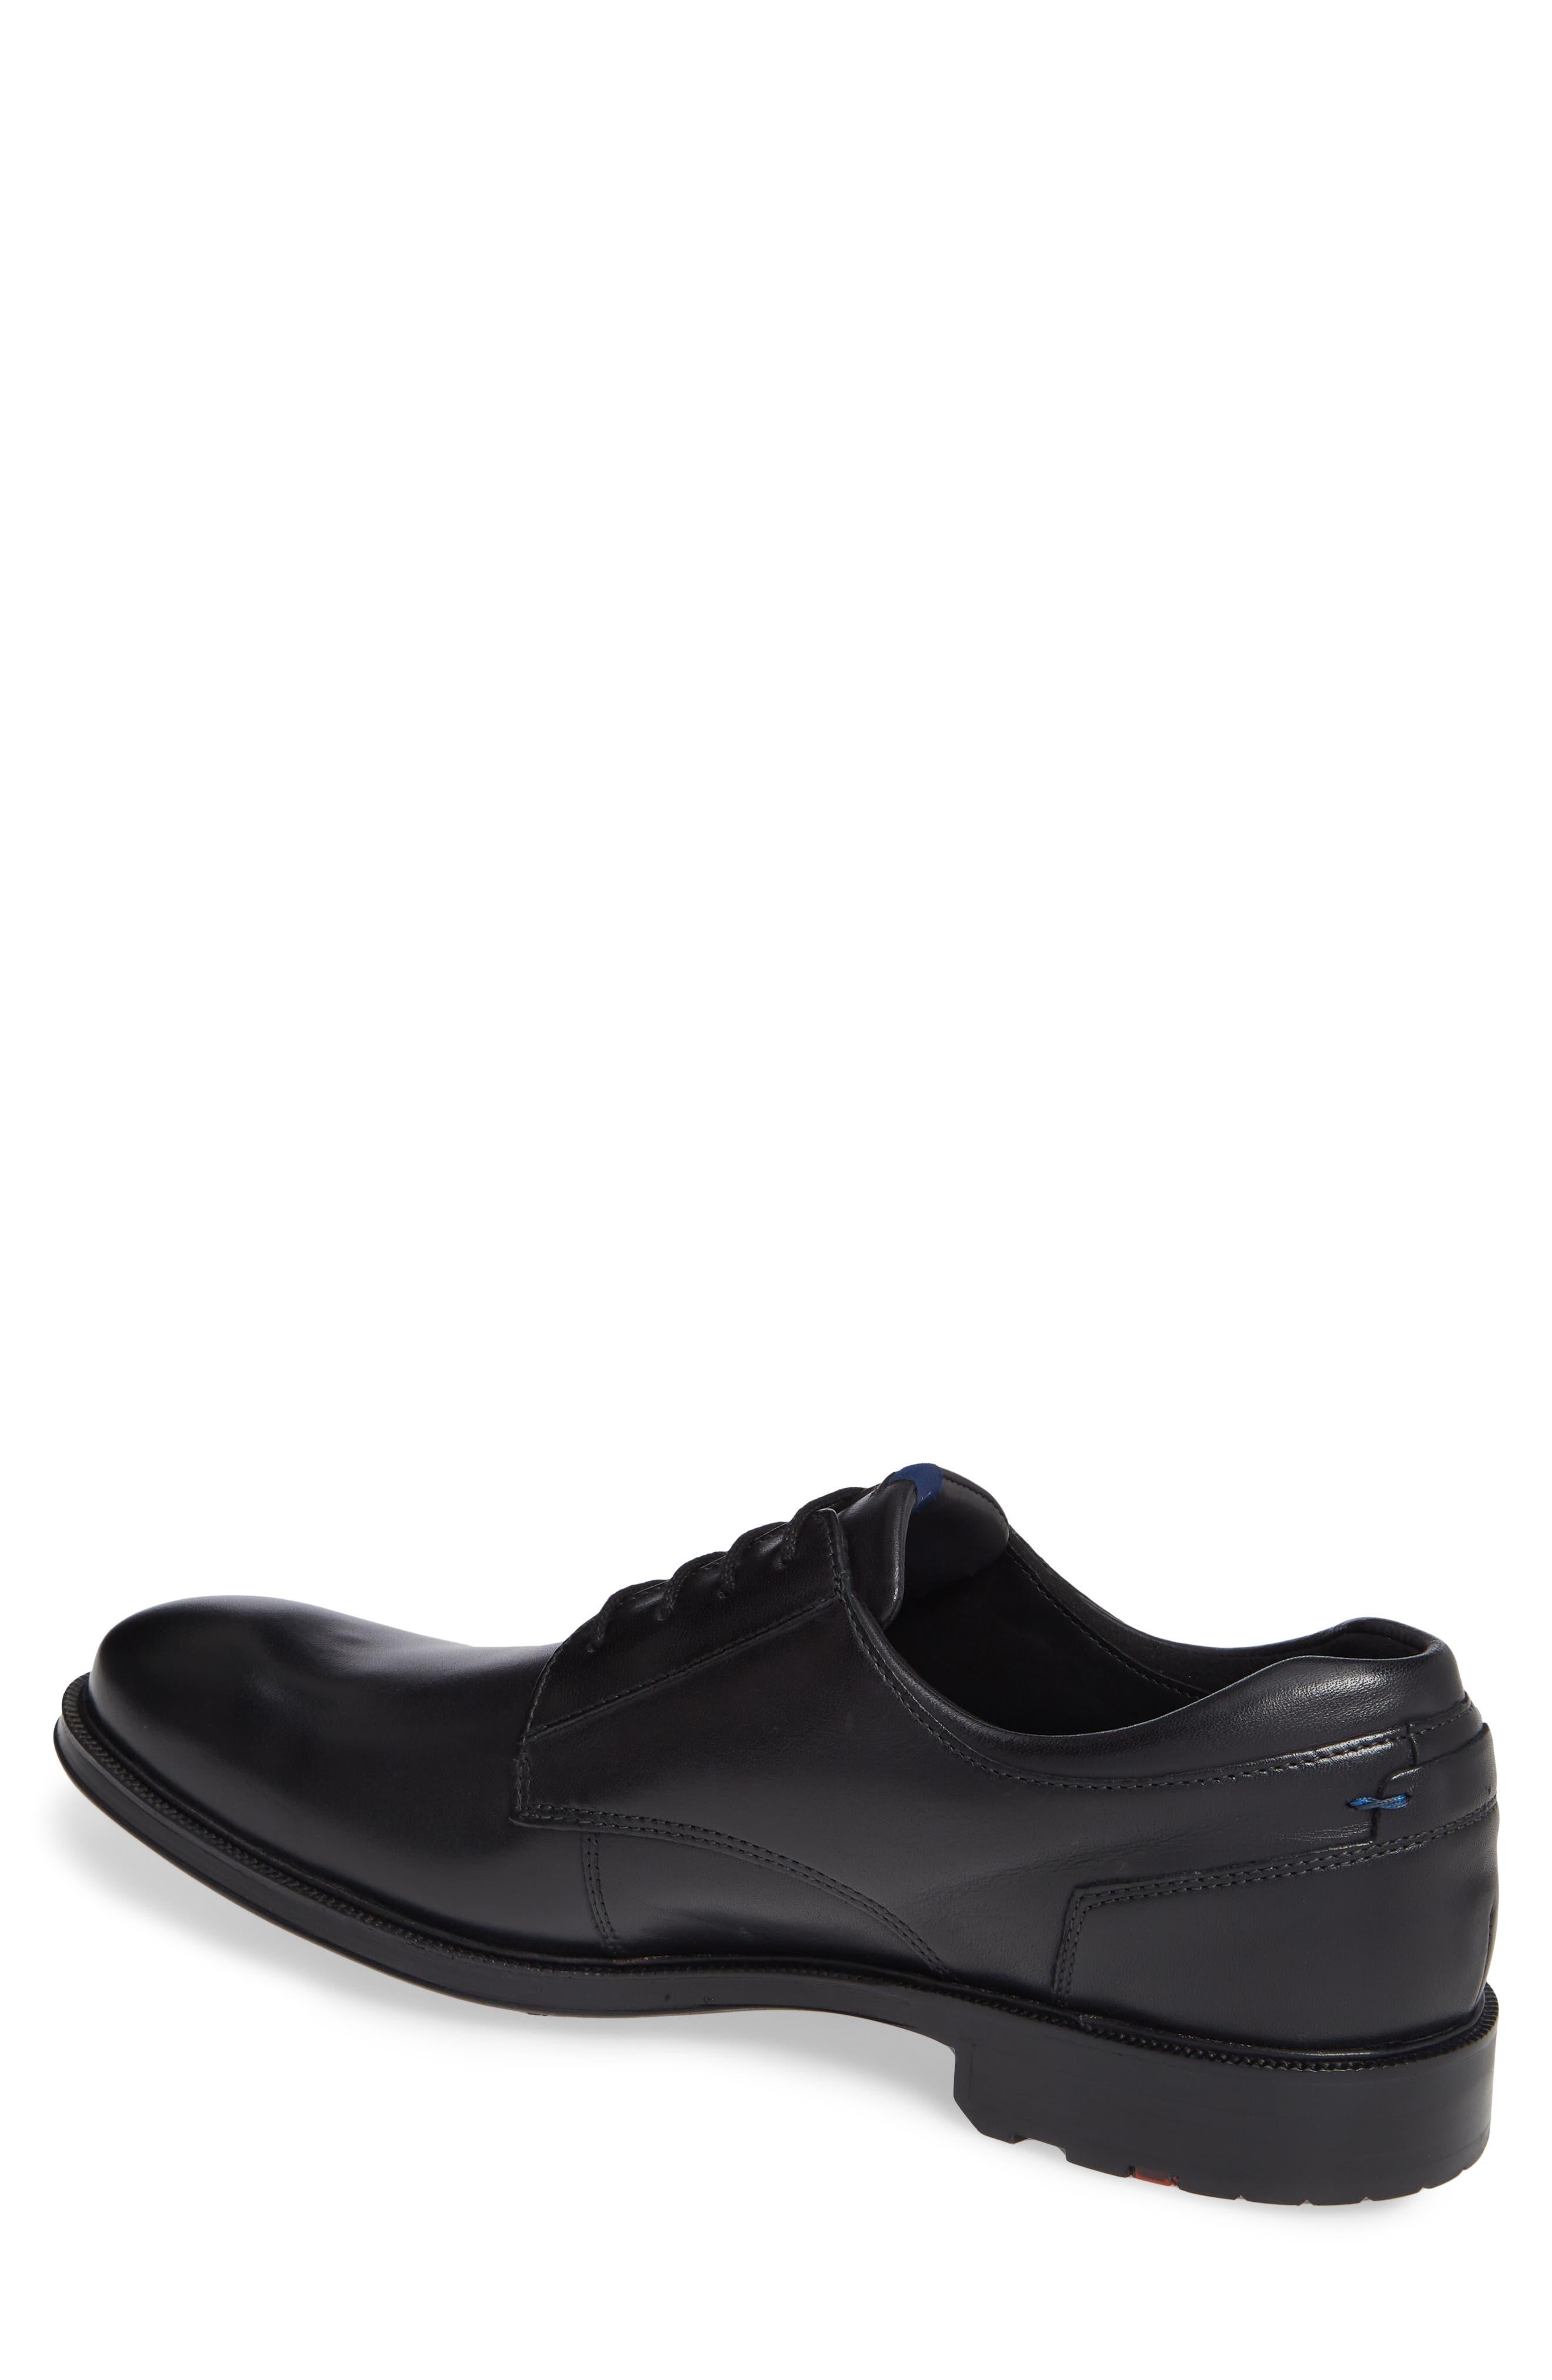 Veria Gore-Tex<sup>®</sup> Plain Toe Derby,                             Alternate thumbnail 2, color,                             BLACK LEATHER